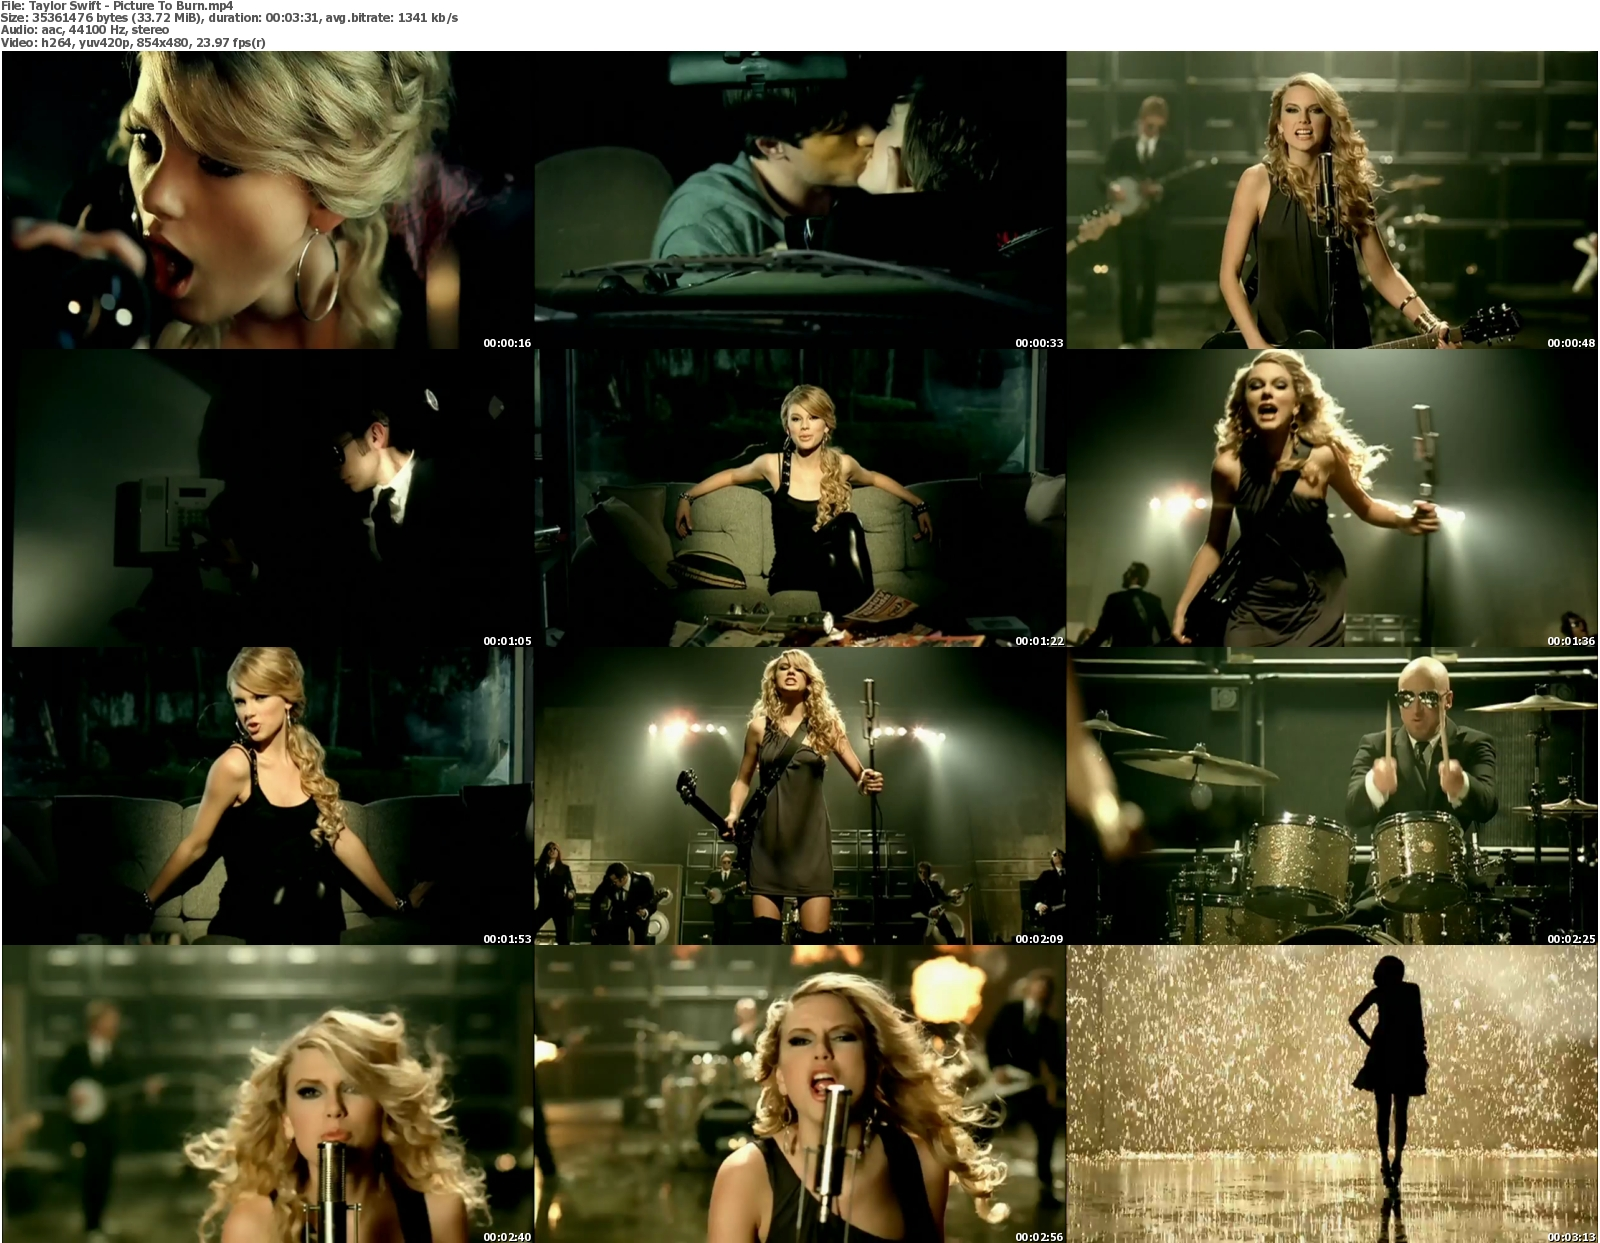 http://4.bp.blogspot.com/-eELsFyBL_Aw/T6IvjqryUHI/AAAAAAAAHNU/atA__i1Jy70/s1600/Taylor+Swift+-+Picture+To+Burn_s.jpg